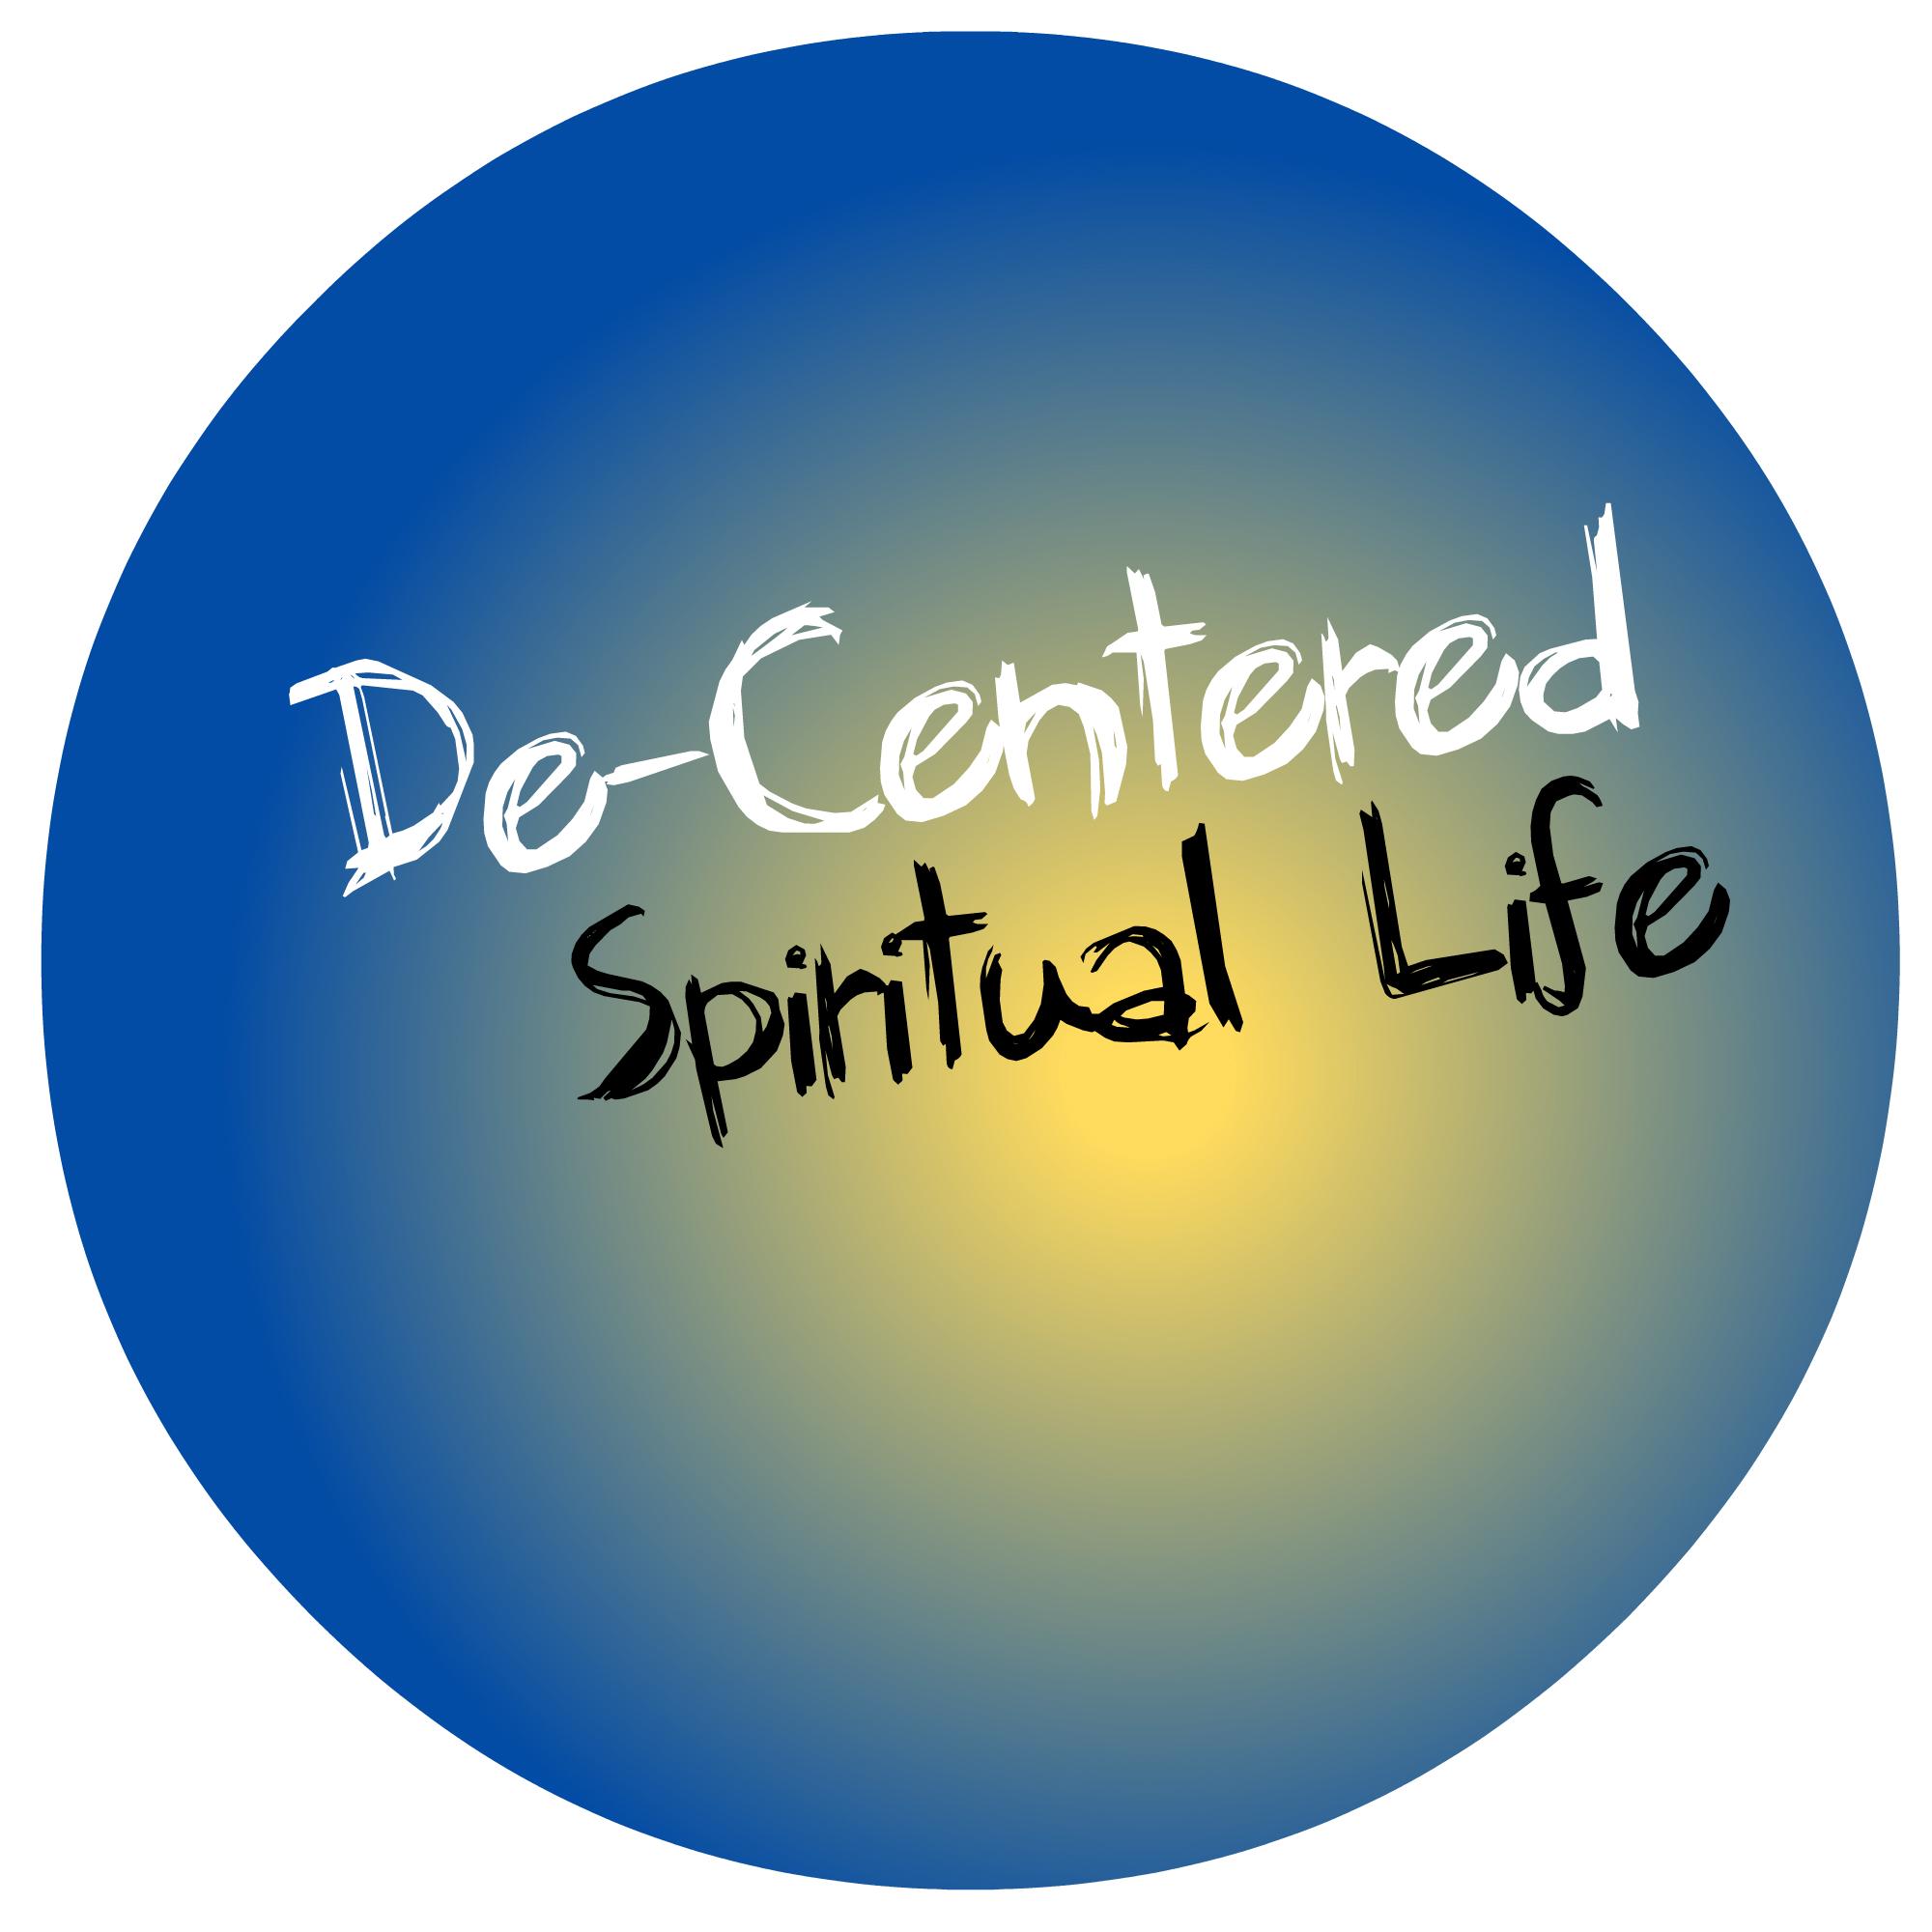 De-centering Your Spiritual Life